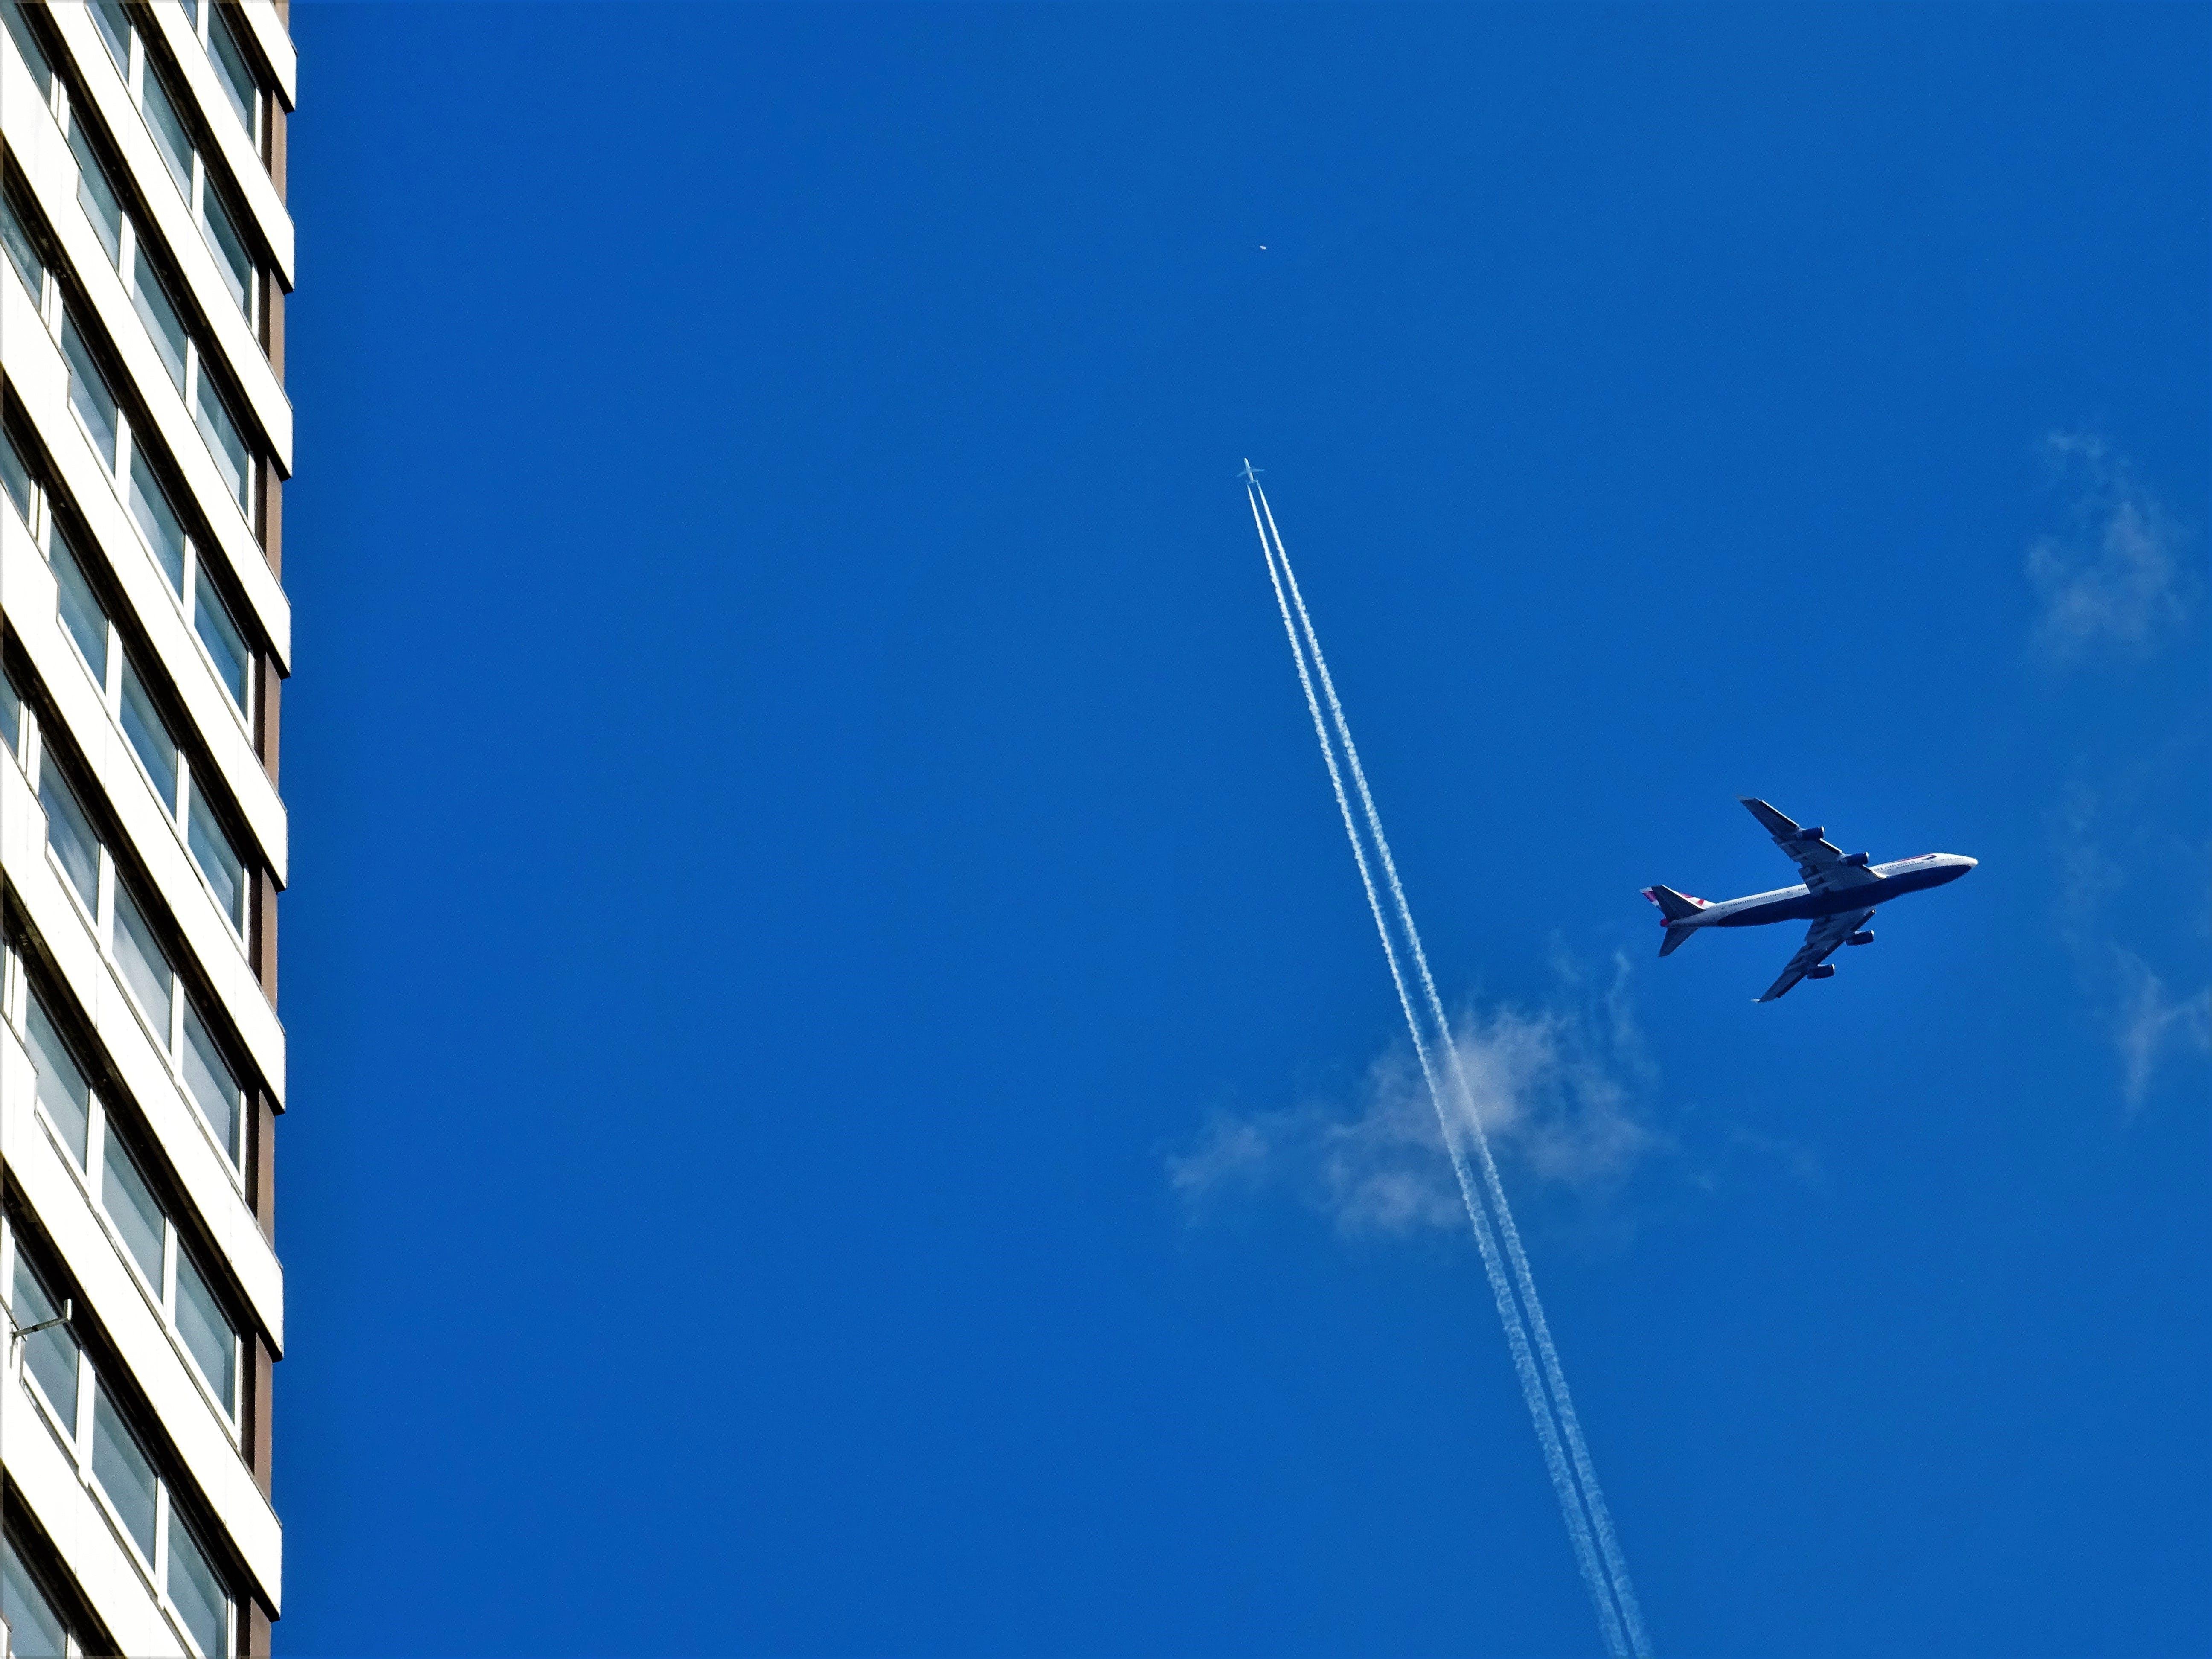 Grey Passenger Plane on Sky at Daytime